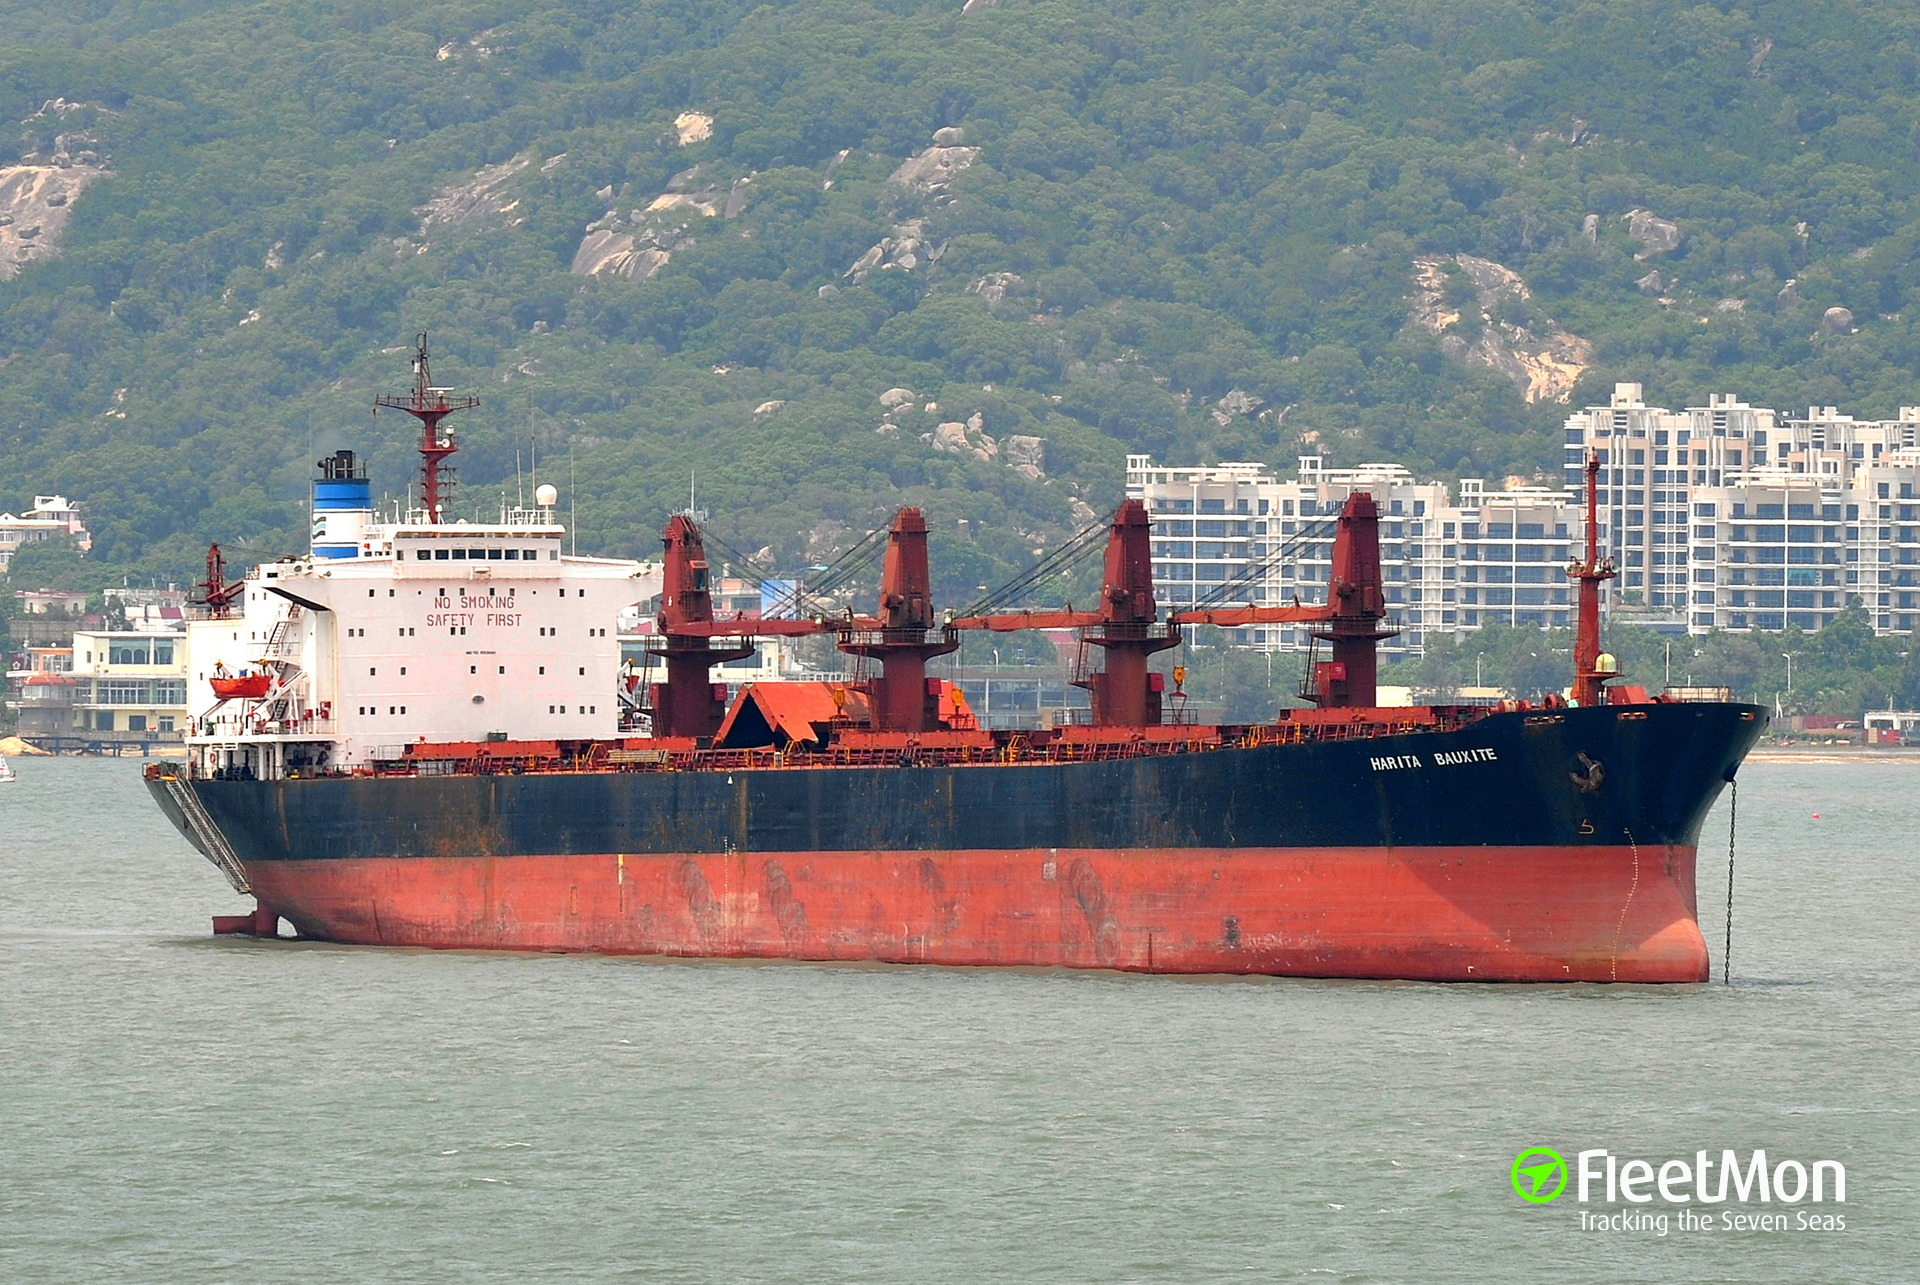 Singapore bulk cariier Harita Bauxite sank in South China sea, 1 dead, 14 missing